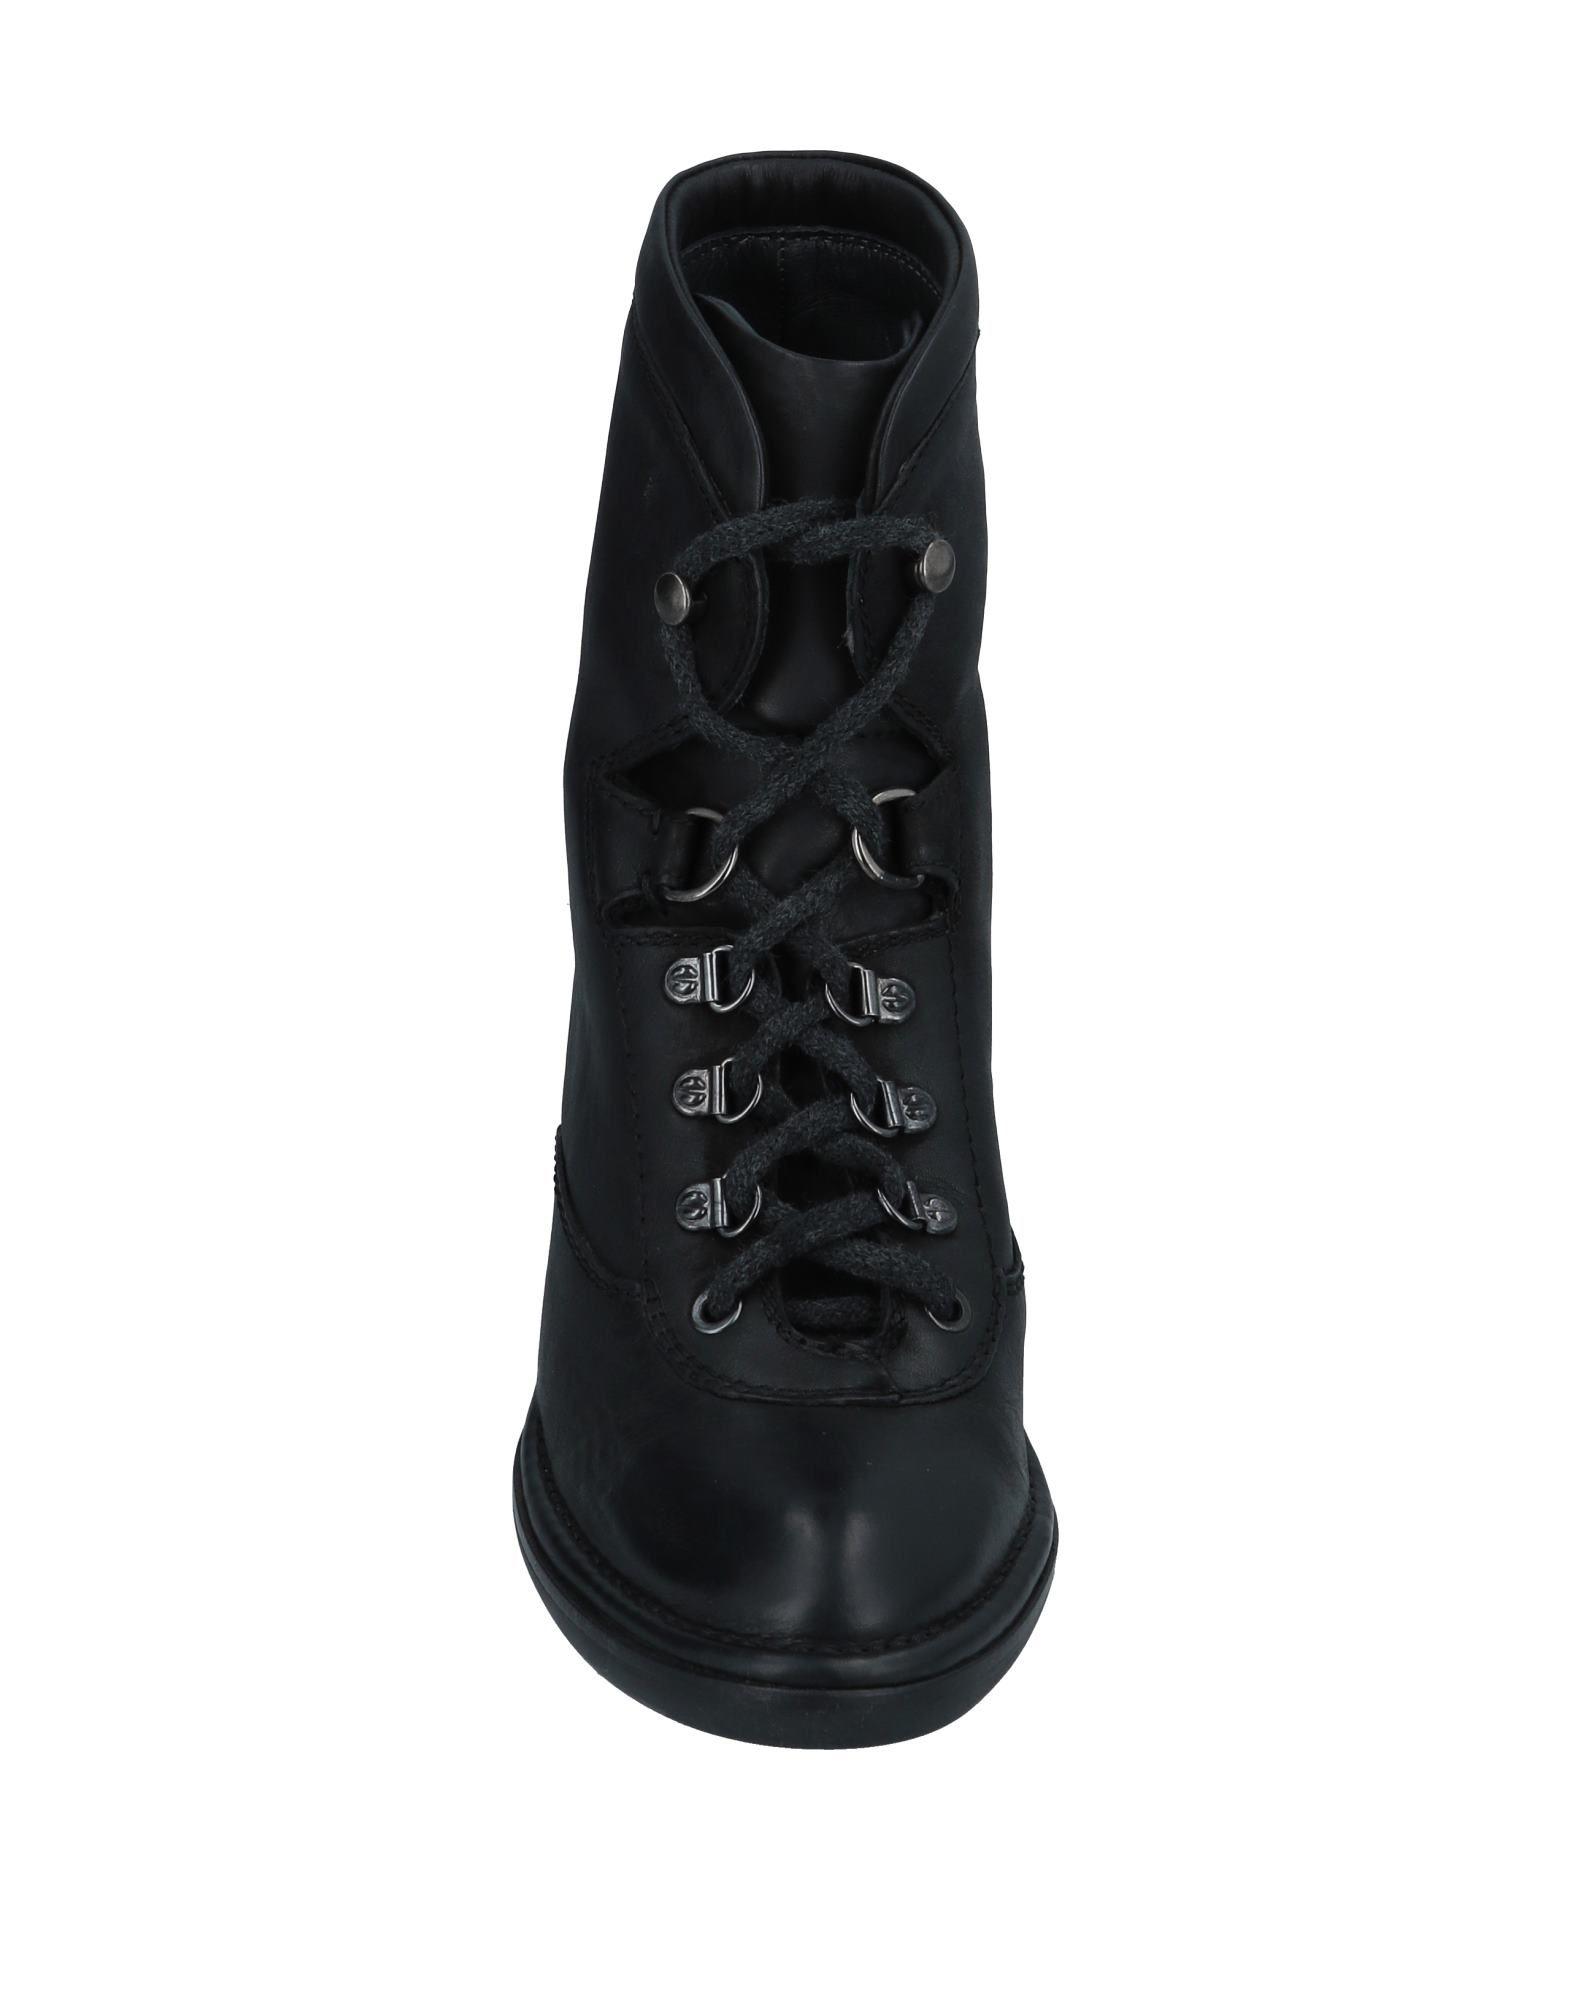 Stilvolle billige Schuhe  Alberto Fermani Stiefelette Damen  Schuhe 11546244PN 8343f9